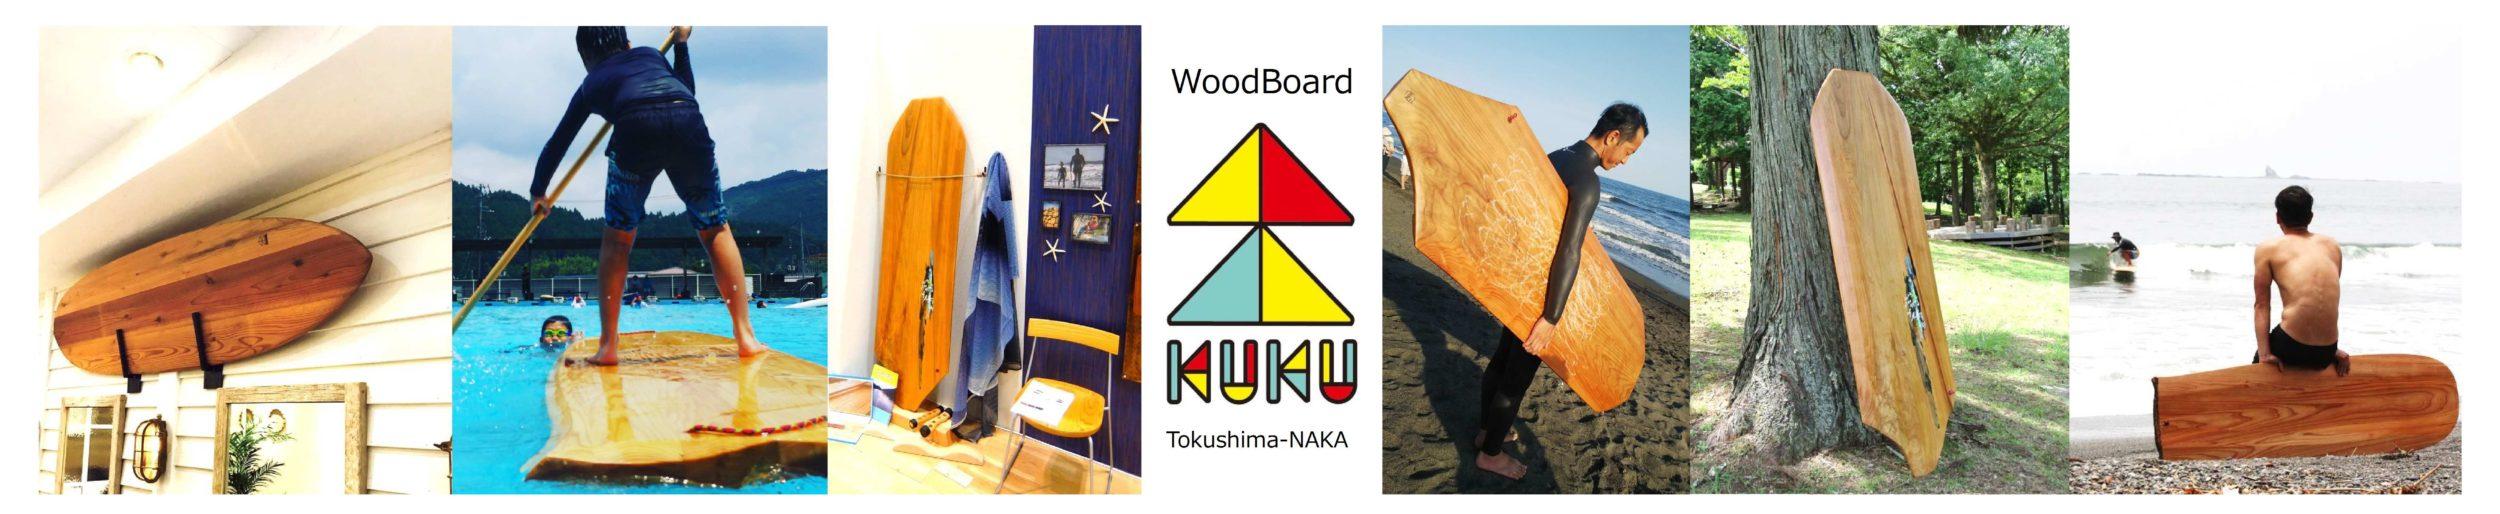 WoodBoard KUKU レジャー・インテリア・ディスプレイ用木製サーフボード・SUPボード